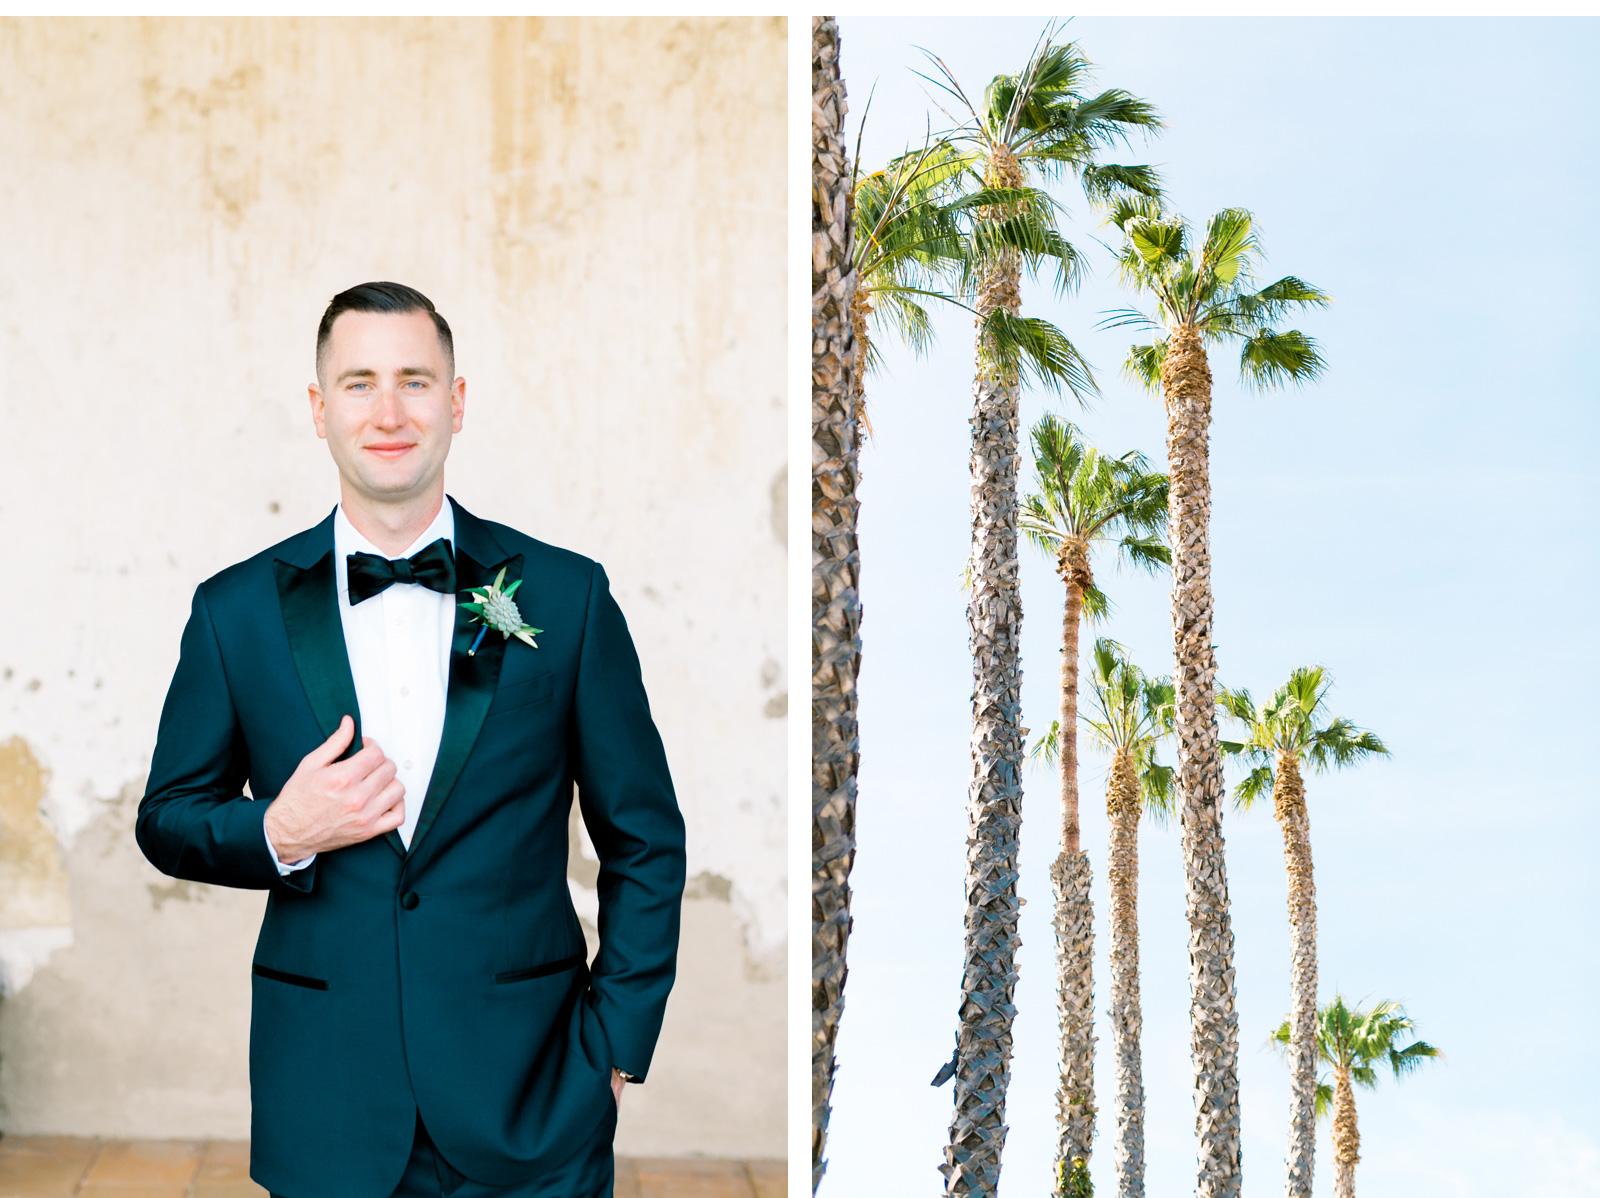 San-Diego-Weddings-Natalie-Schutt-Photography_06.jpg